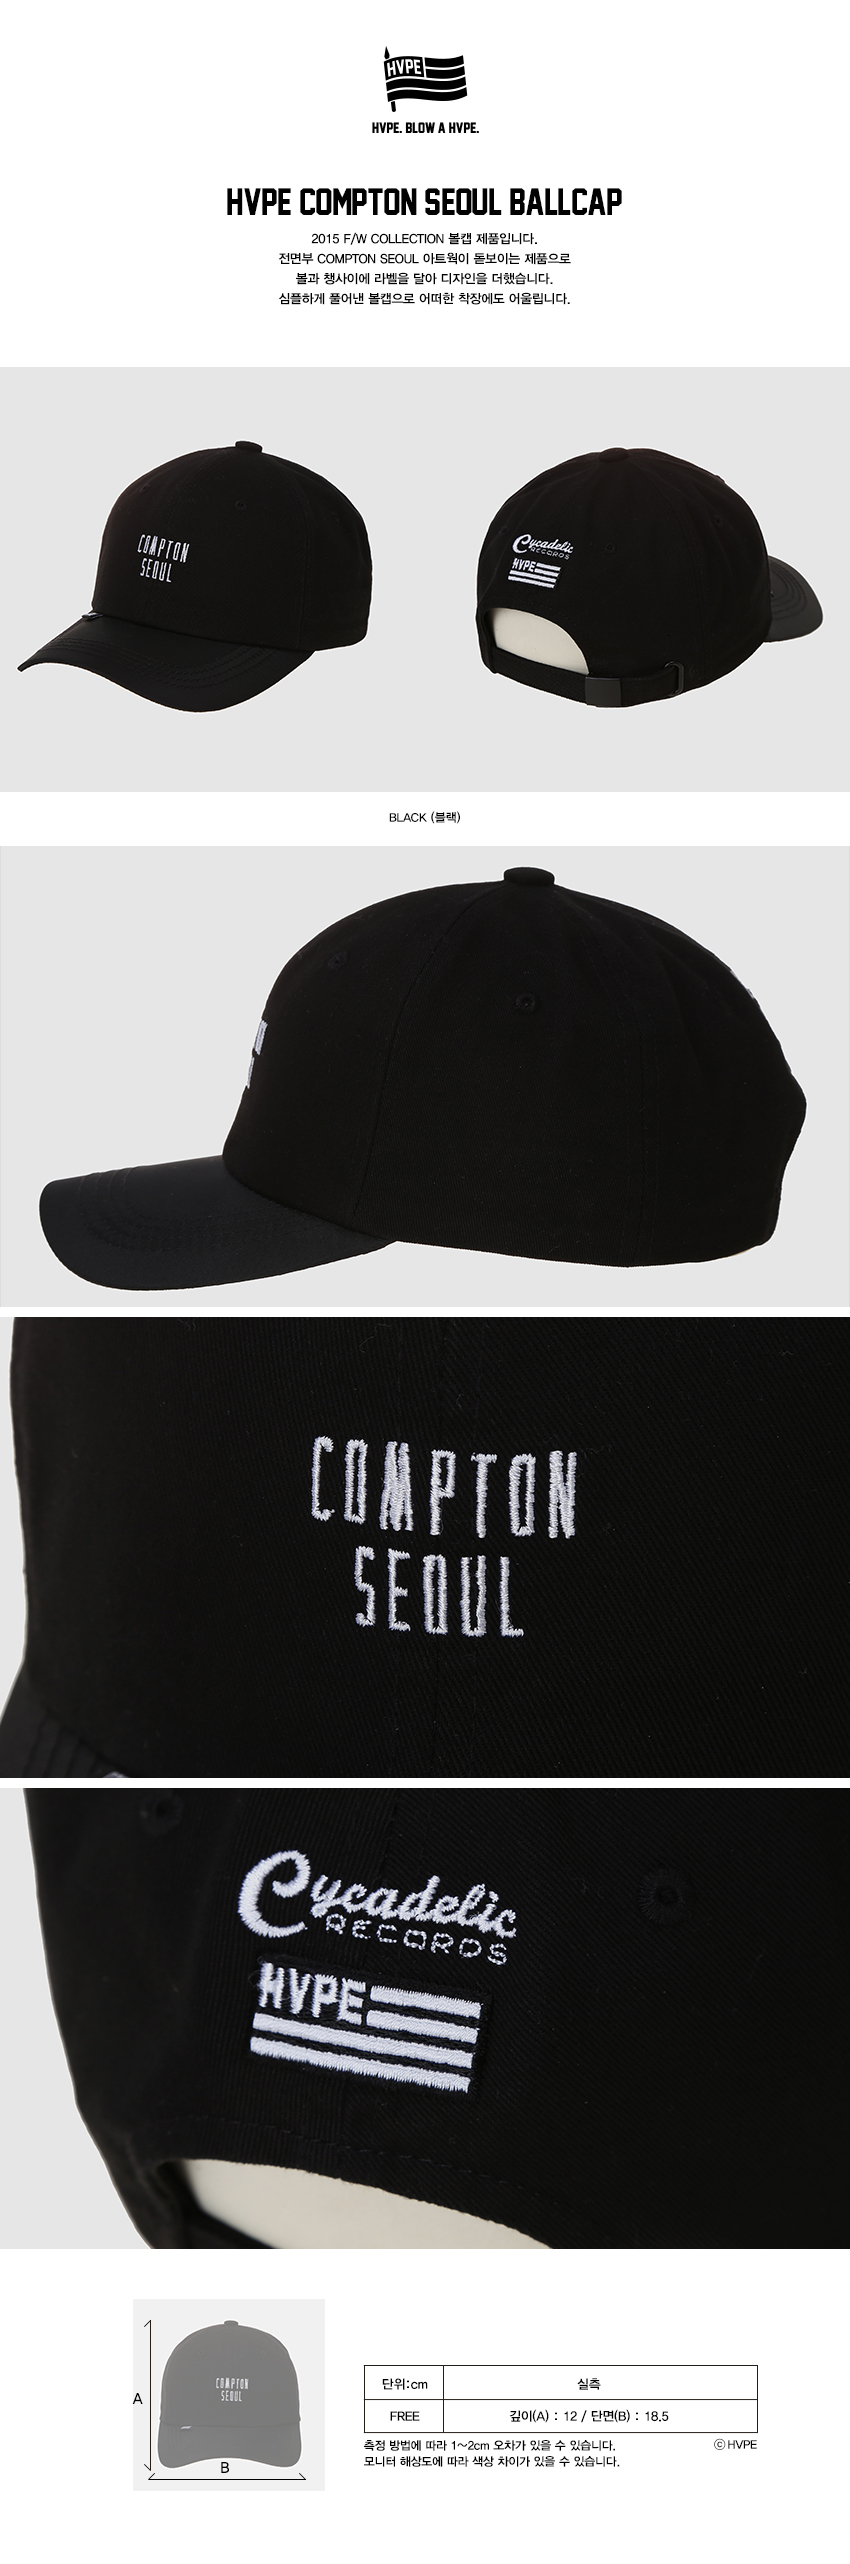 [ HVPE ] [ HVPE ]康普顿首尔球帽